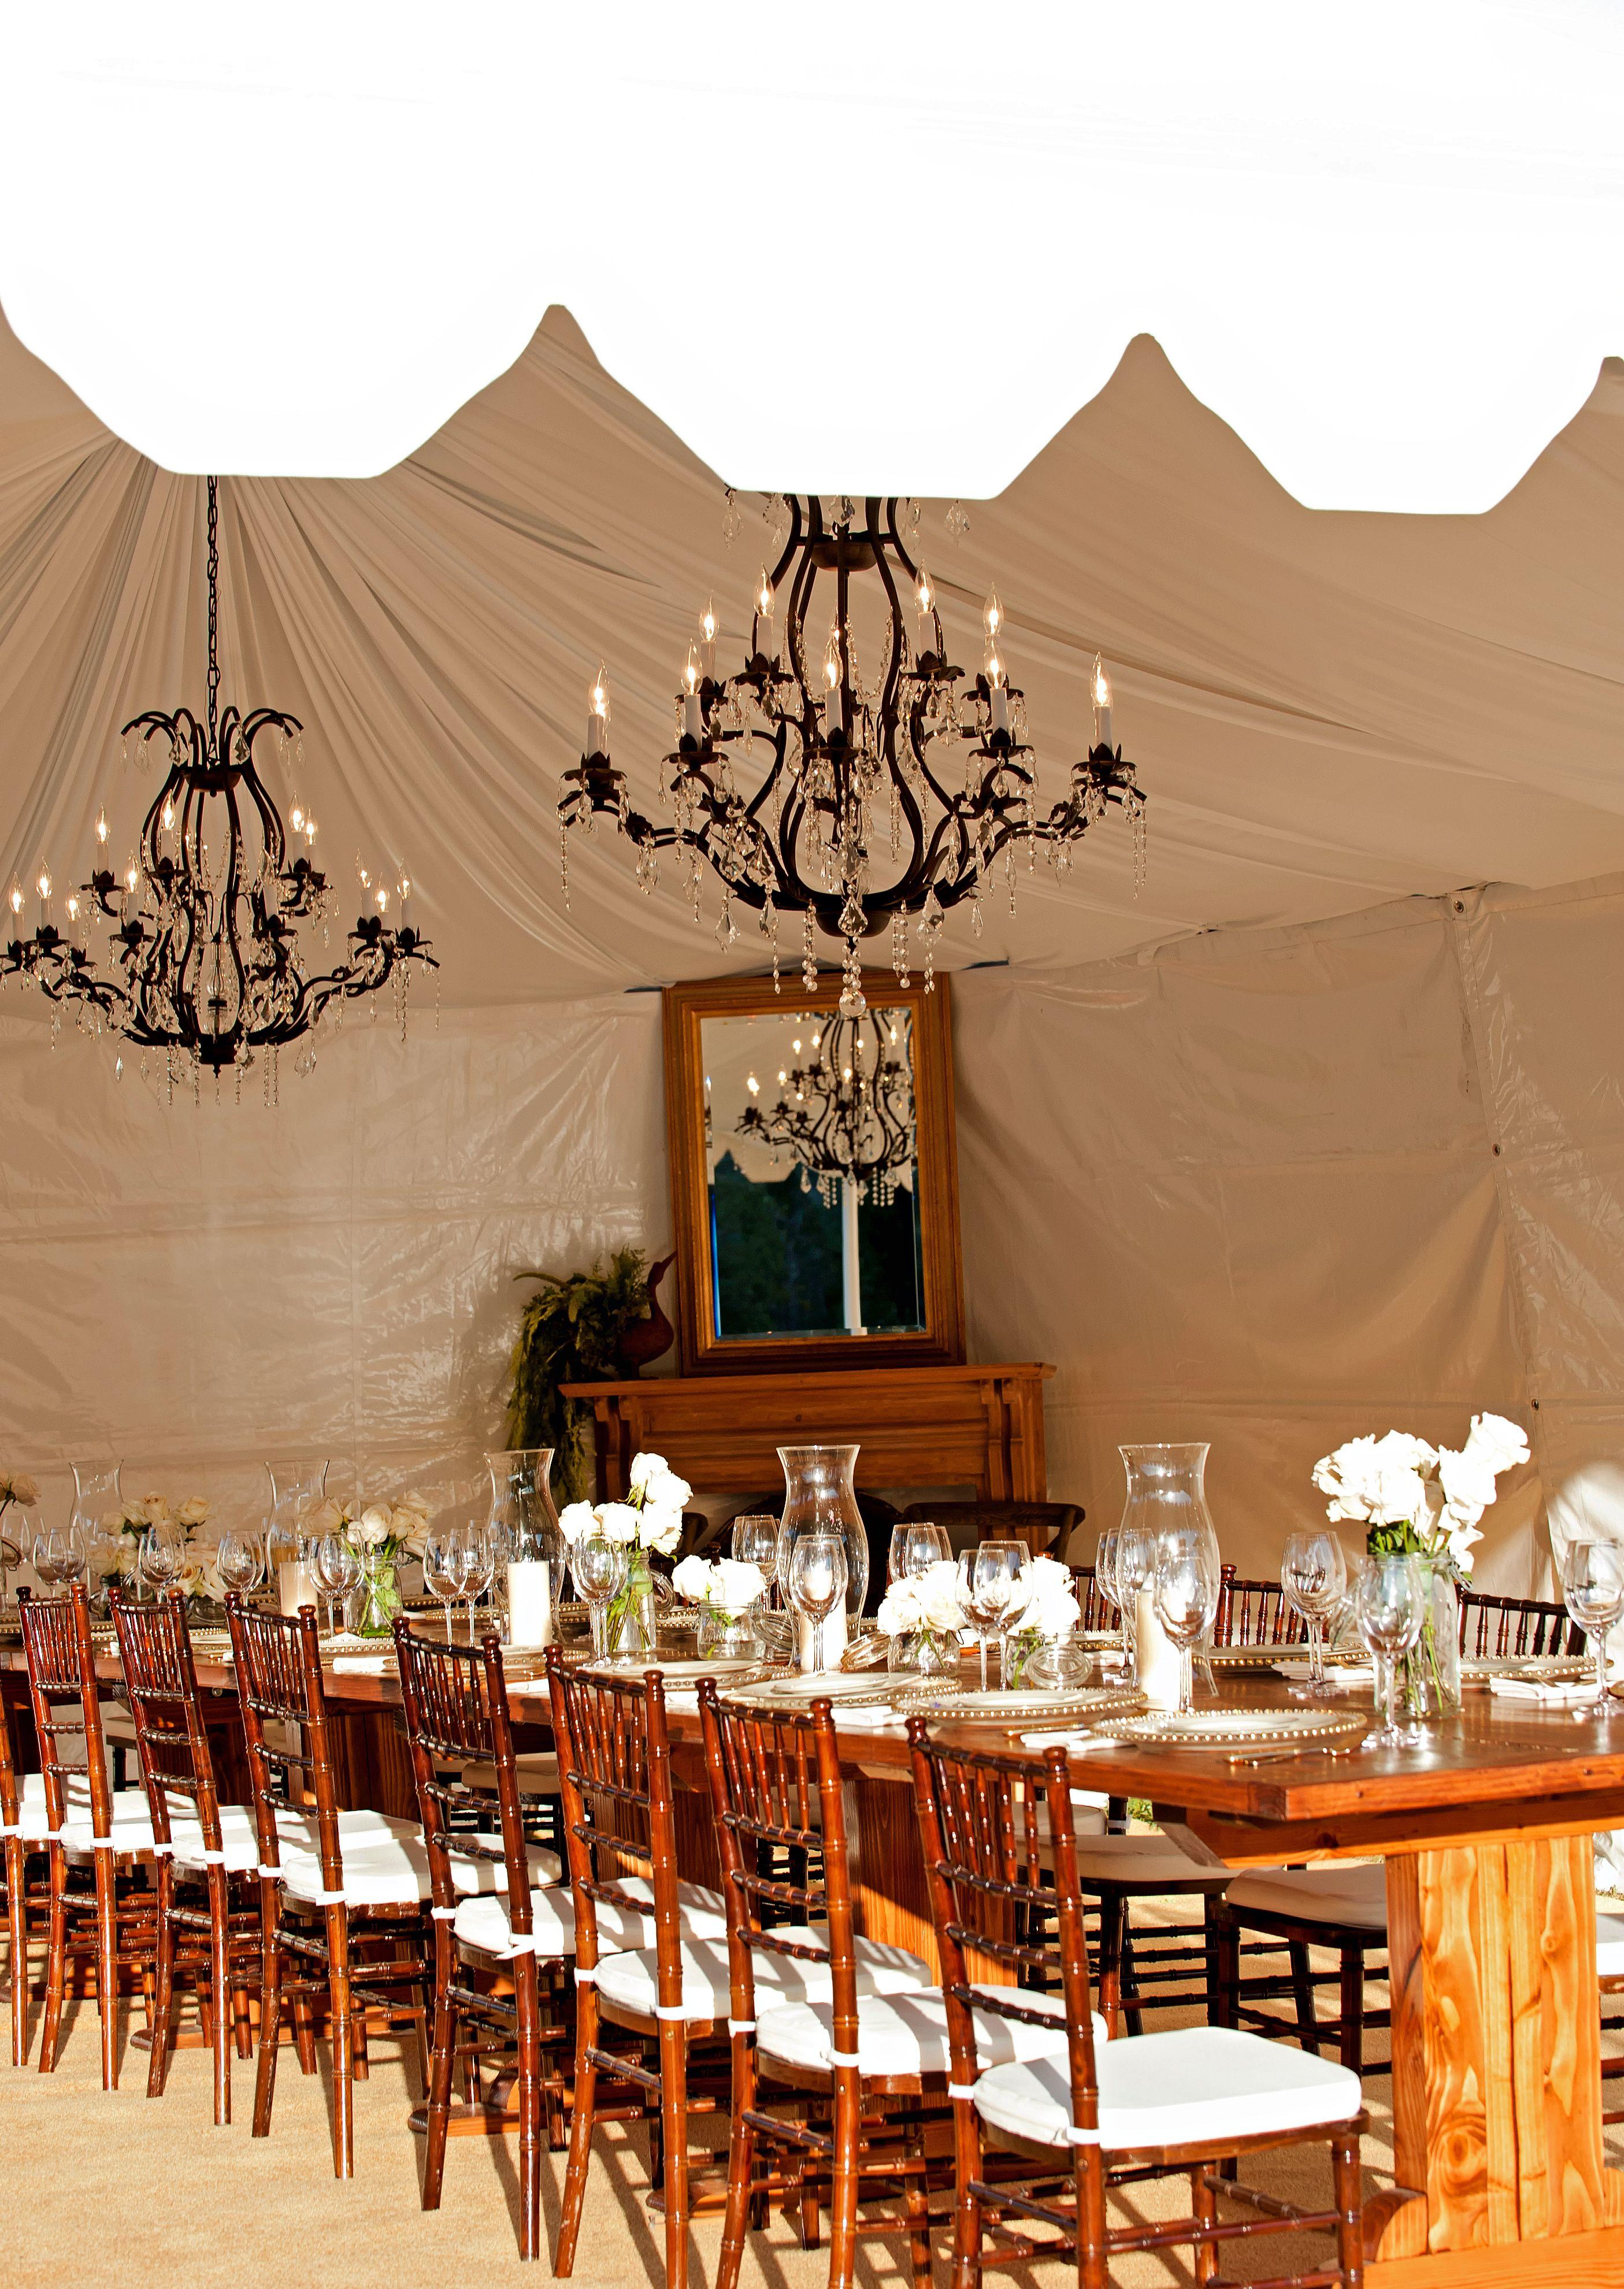 Love tent parties party tent wedding rentals party